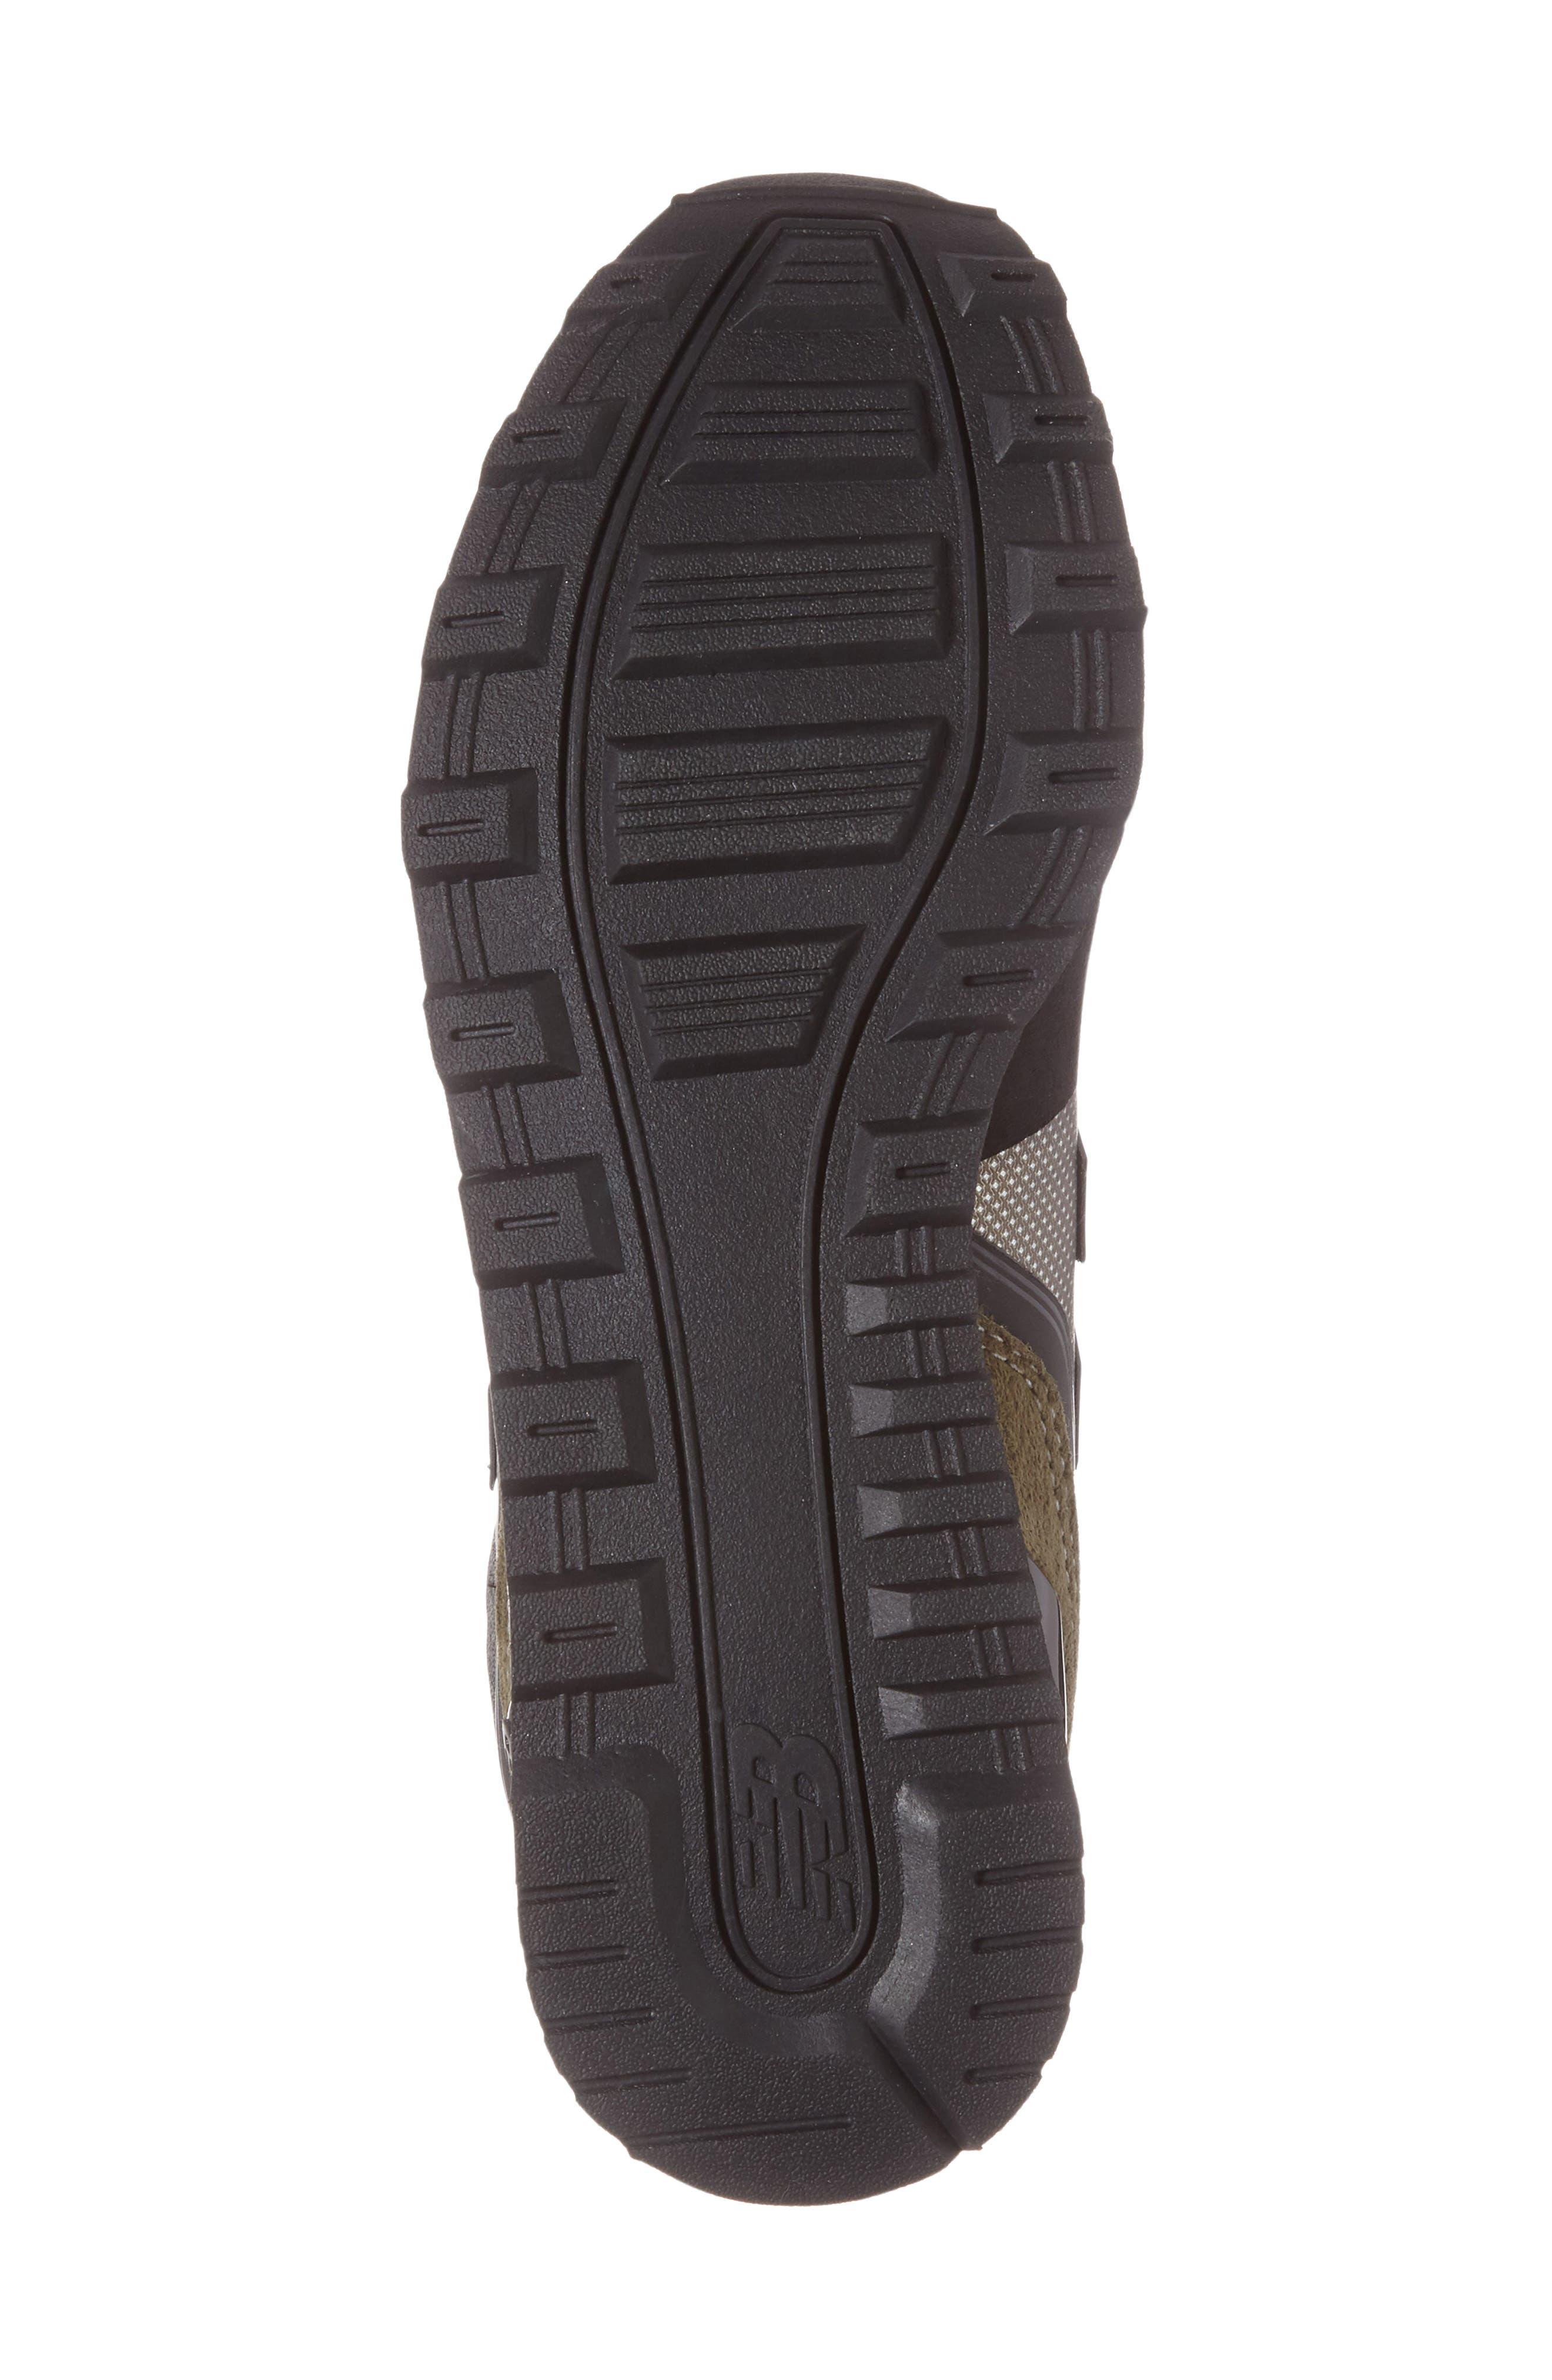 696 Re-Engineered Sneaker,                             Alternate thumbnail 4, color,                             030